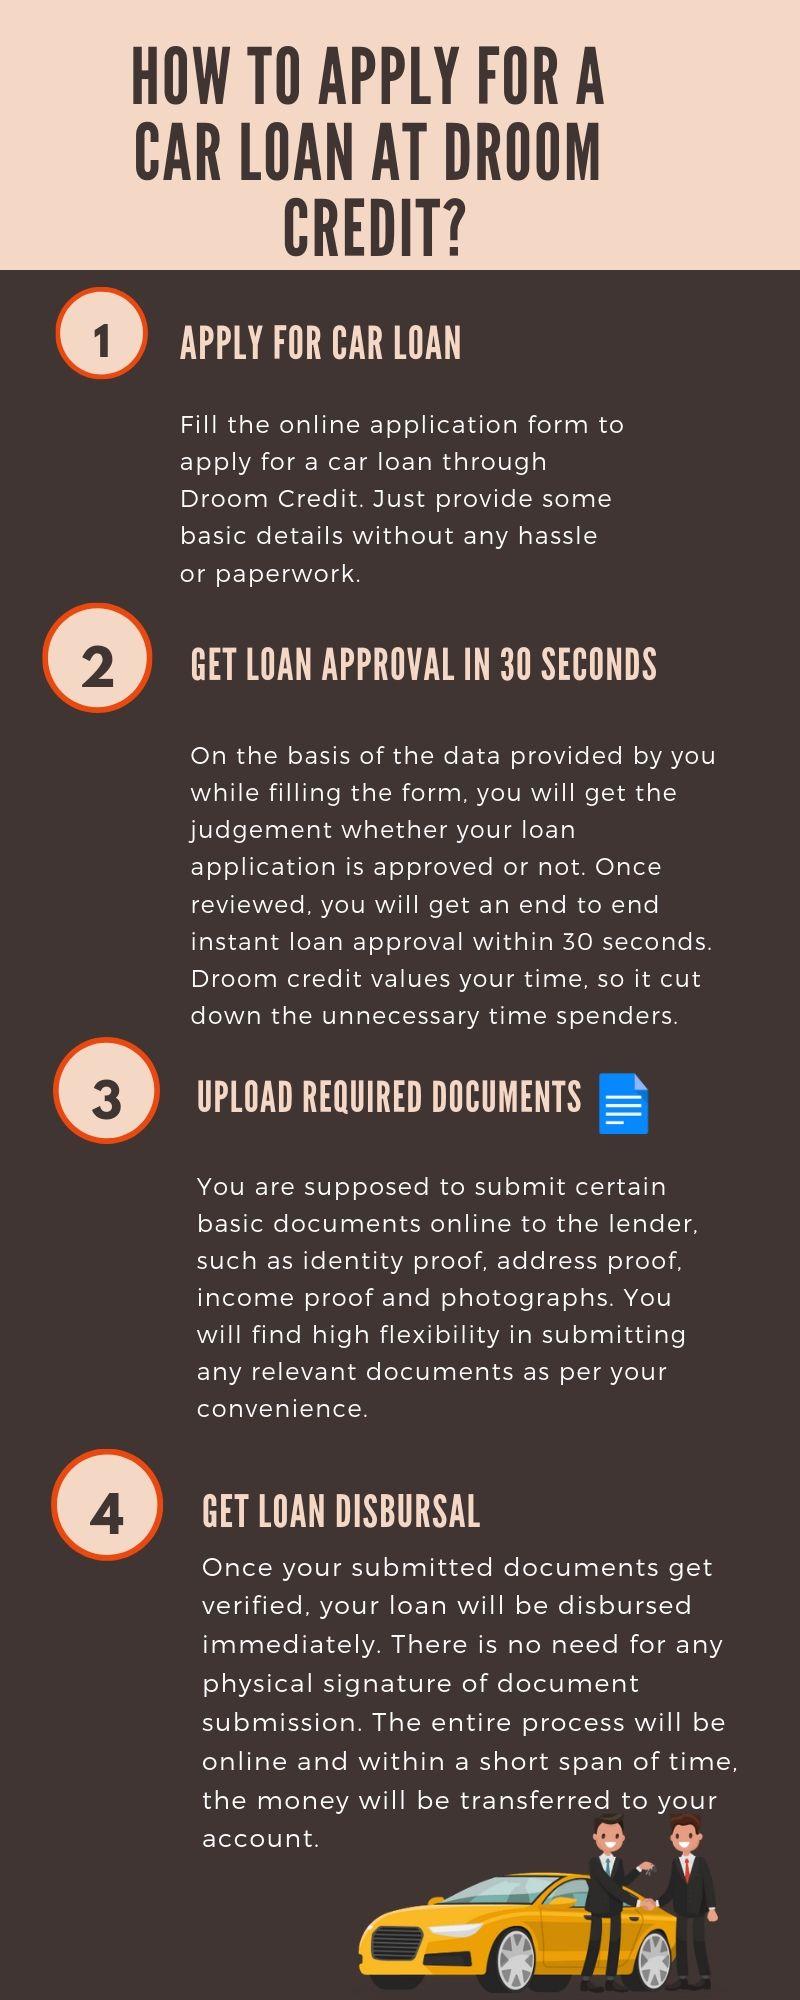 Pin By Sneha Sharma On Droom Credit In 2019 Car Loans Loan